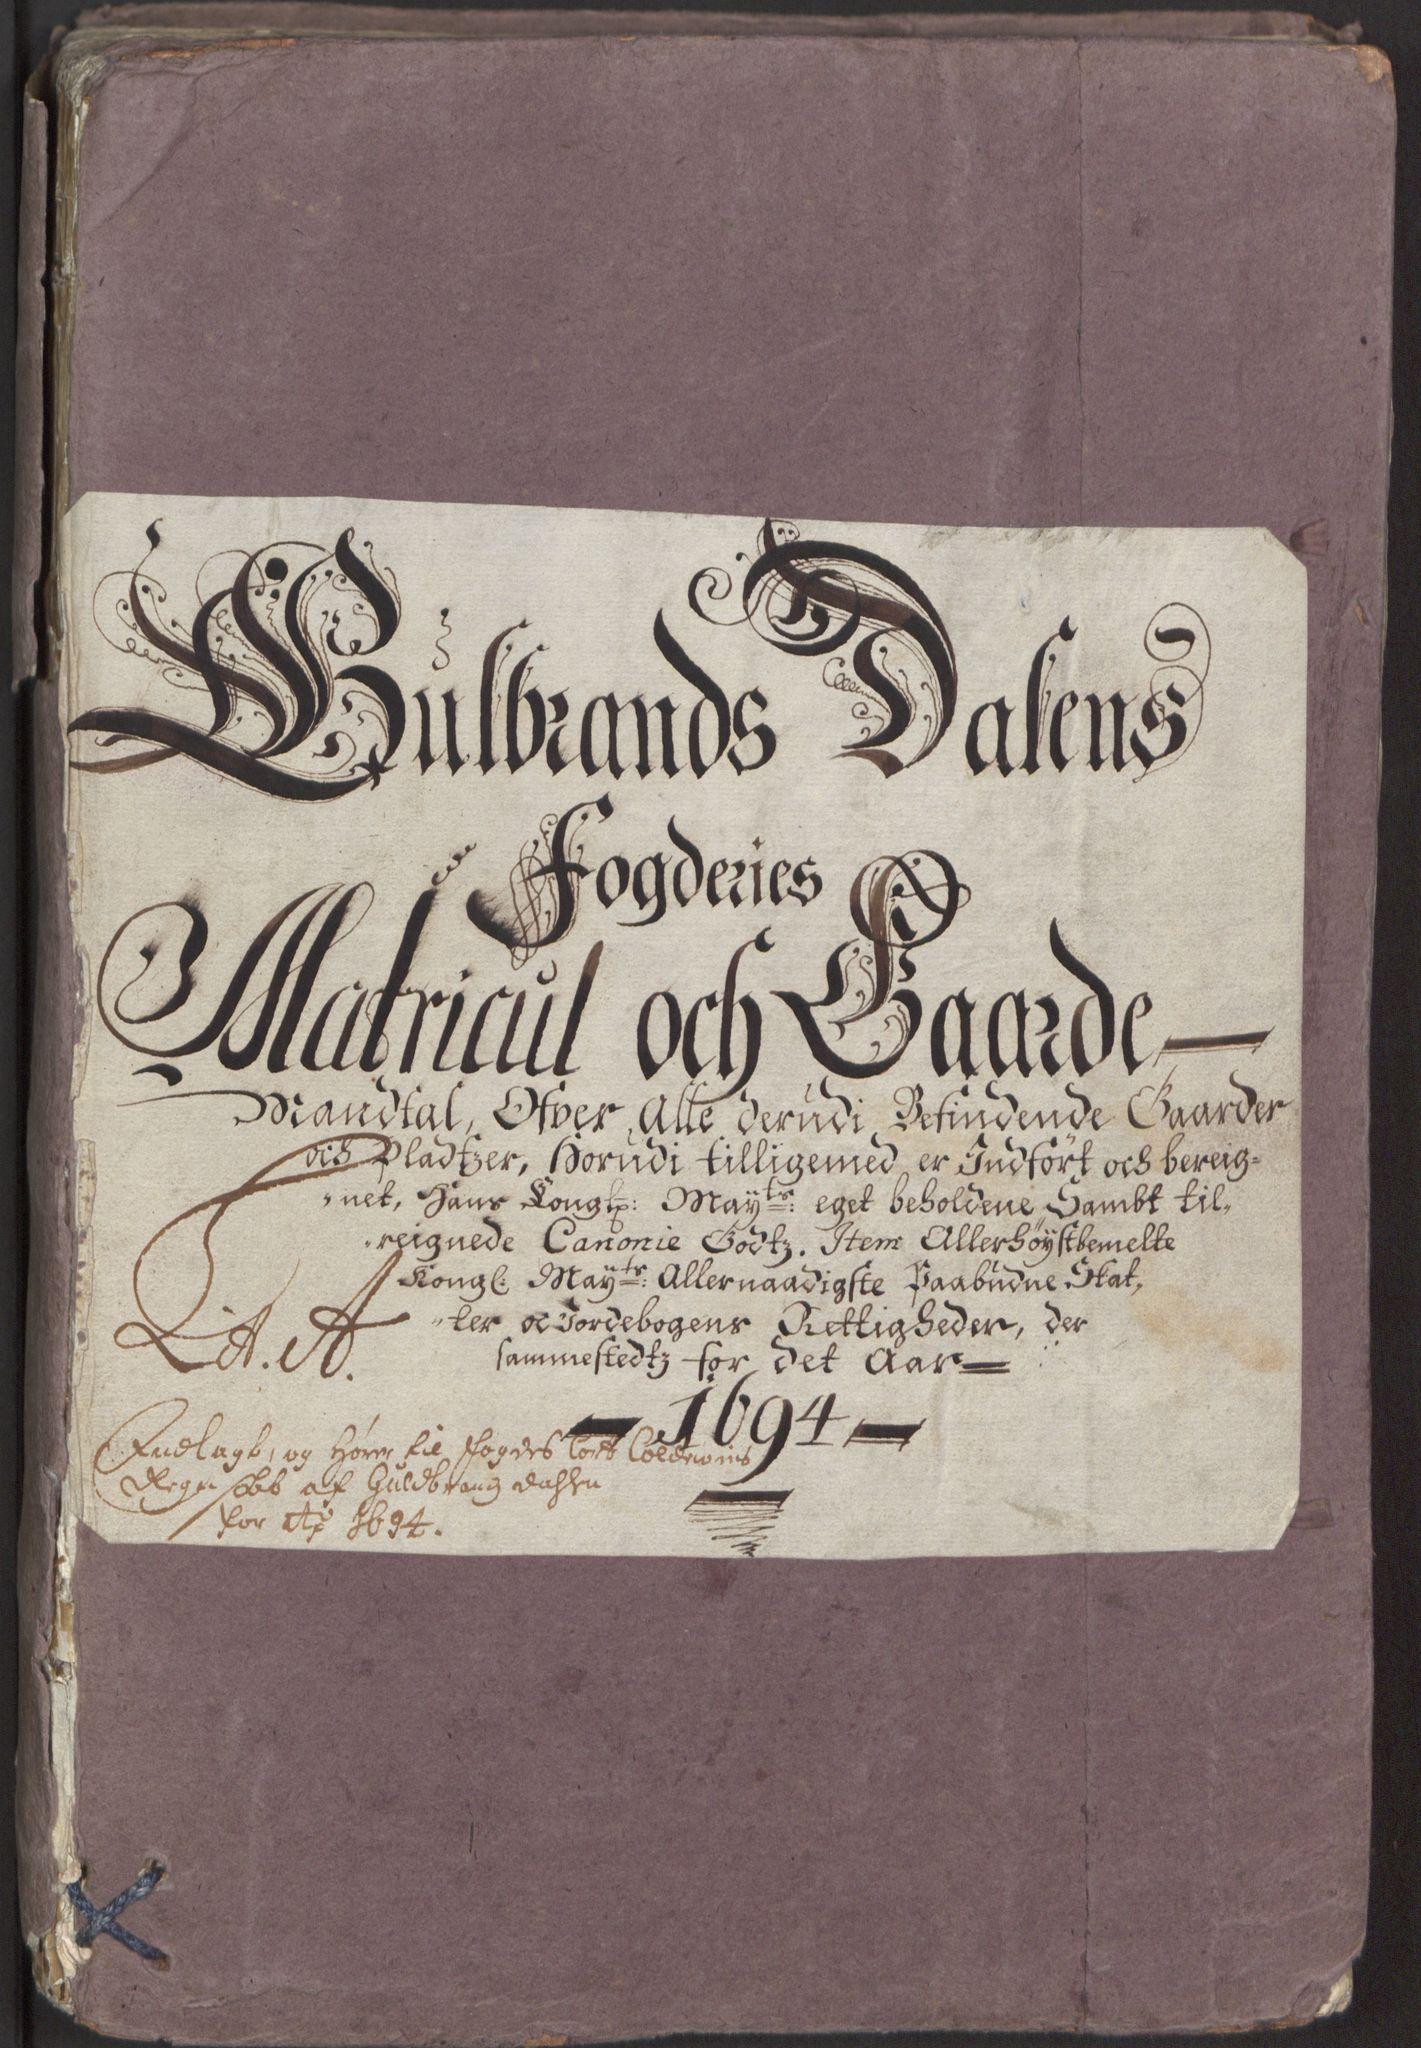 RA, Rentekammeret inntil 1814, Reviderte regnskaper, Fogderegnskap, R17/L1168: Fogderegnskap Gudbrandsdal, 1694, s. 22